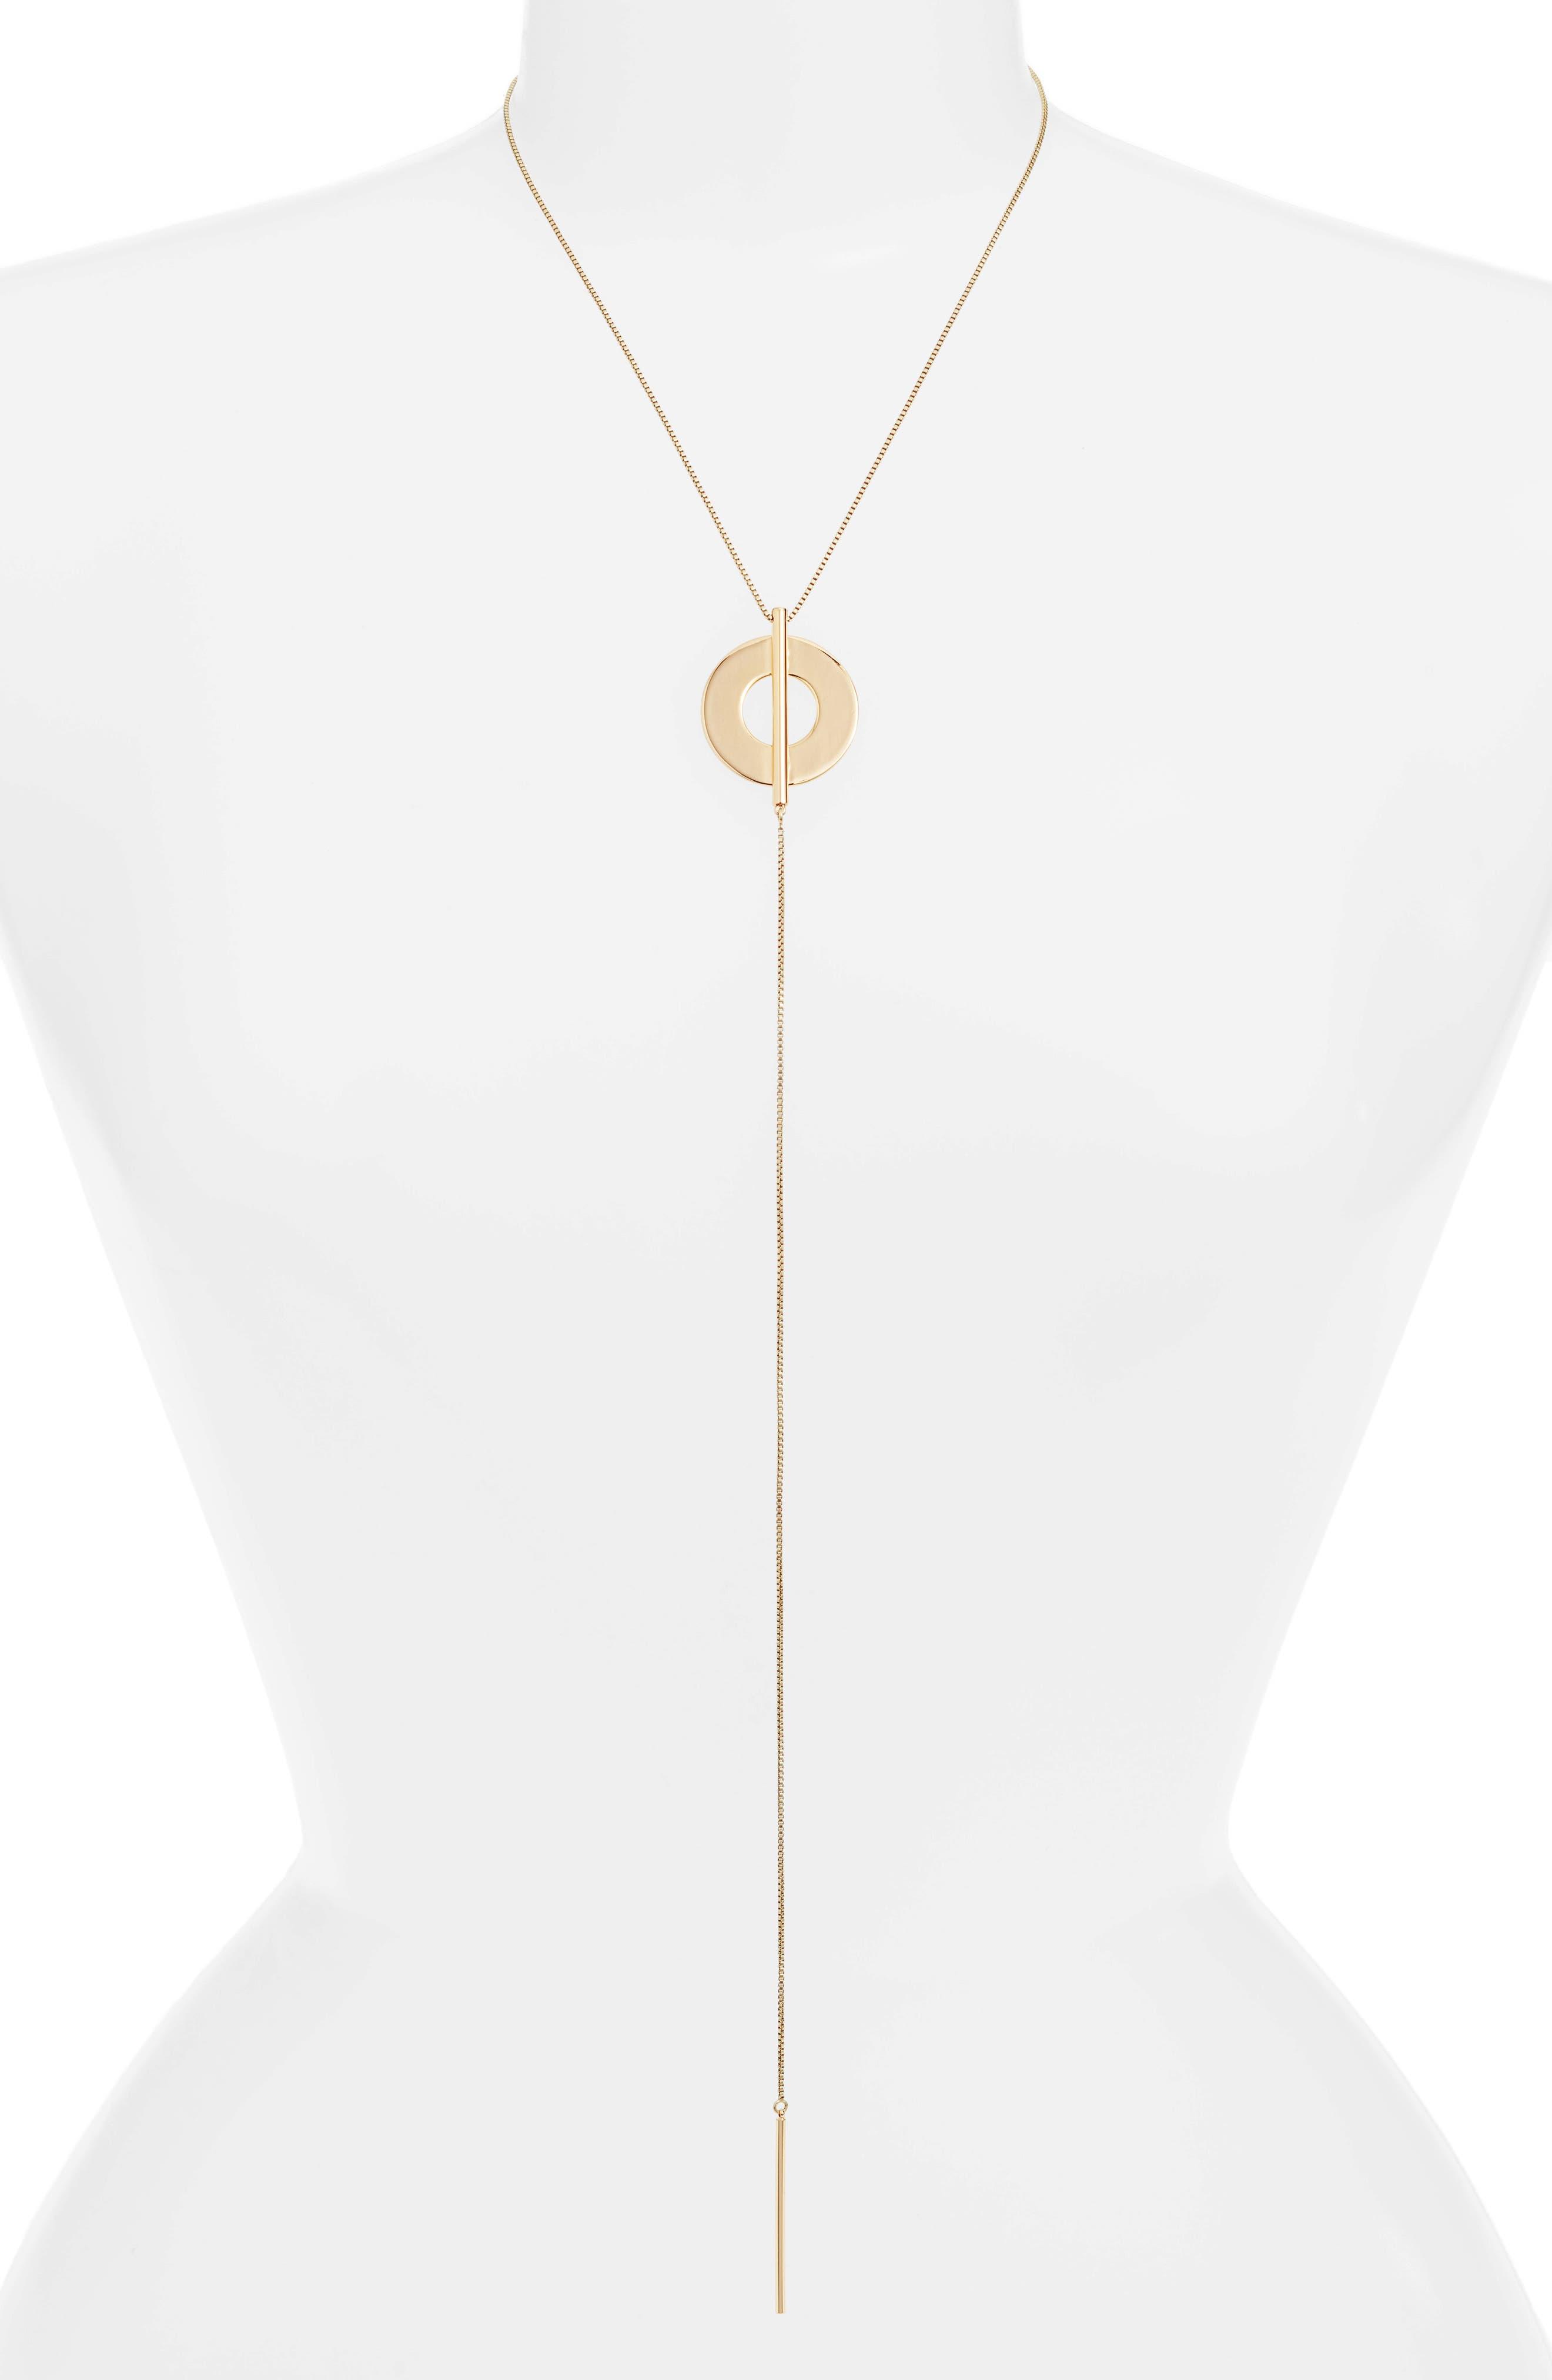 JENNY BIRD Carmine Y-Necklace in Gold